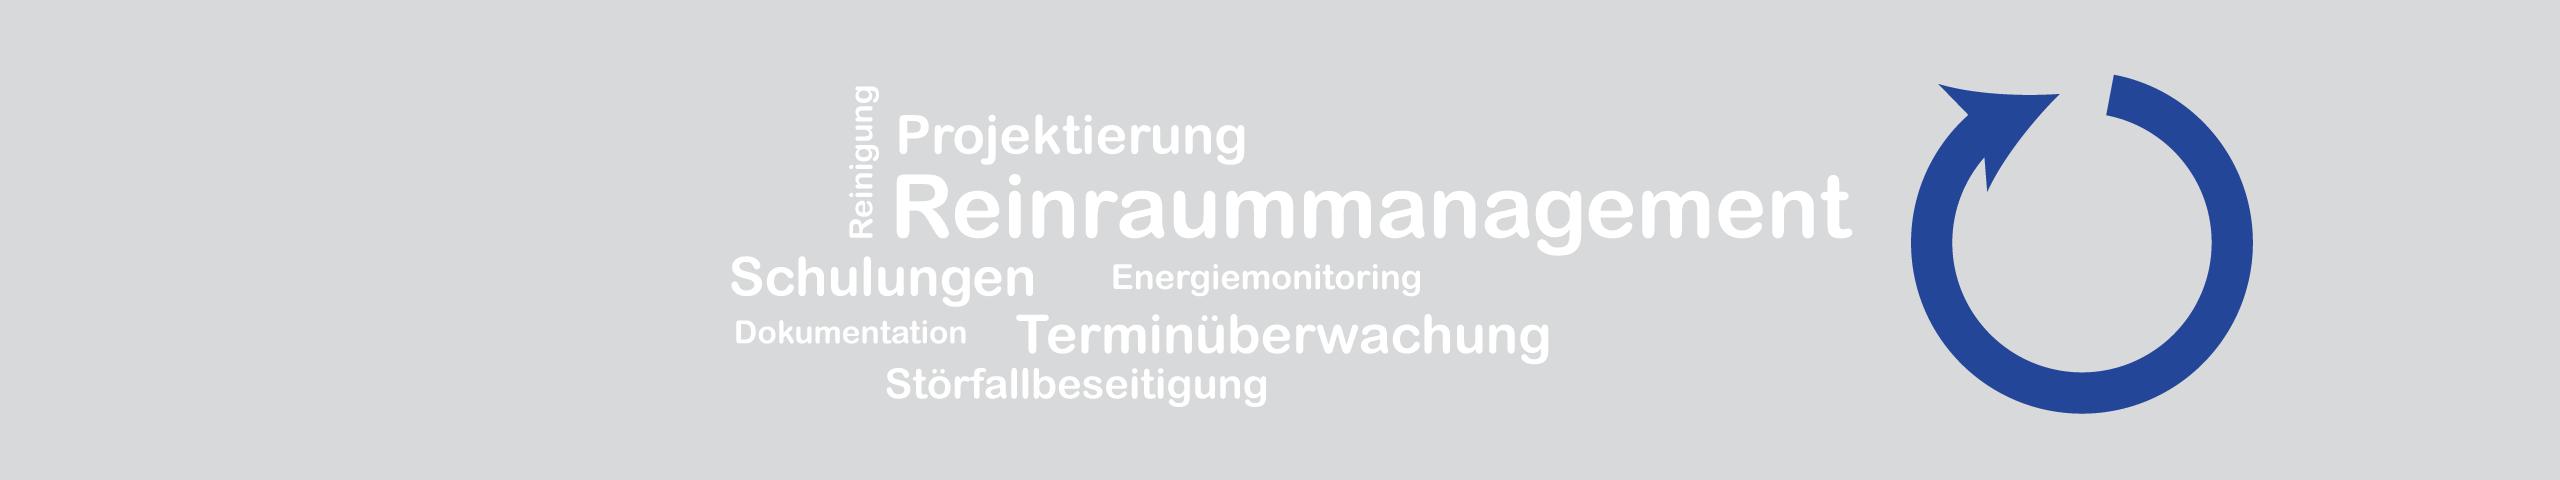 Reinraum-Management